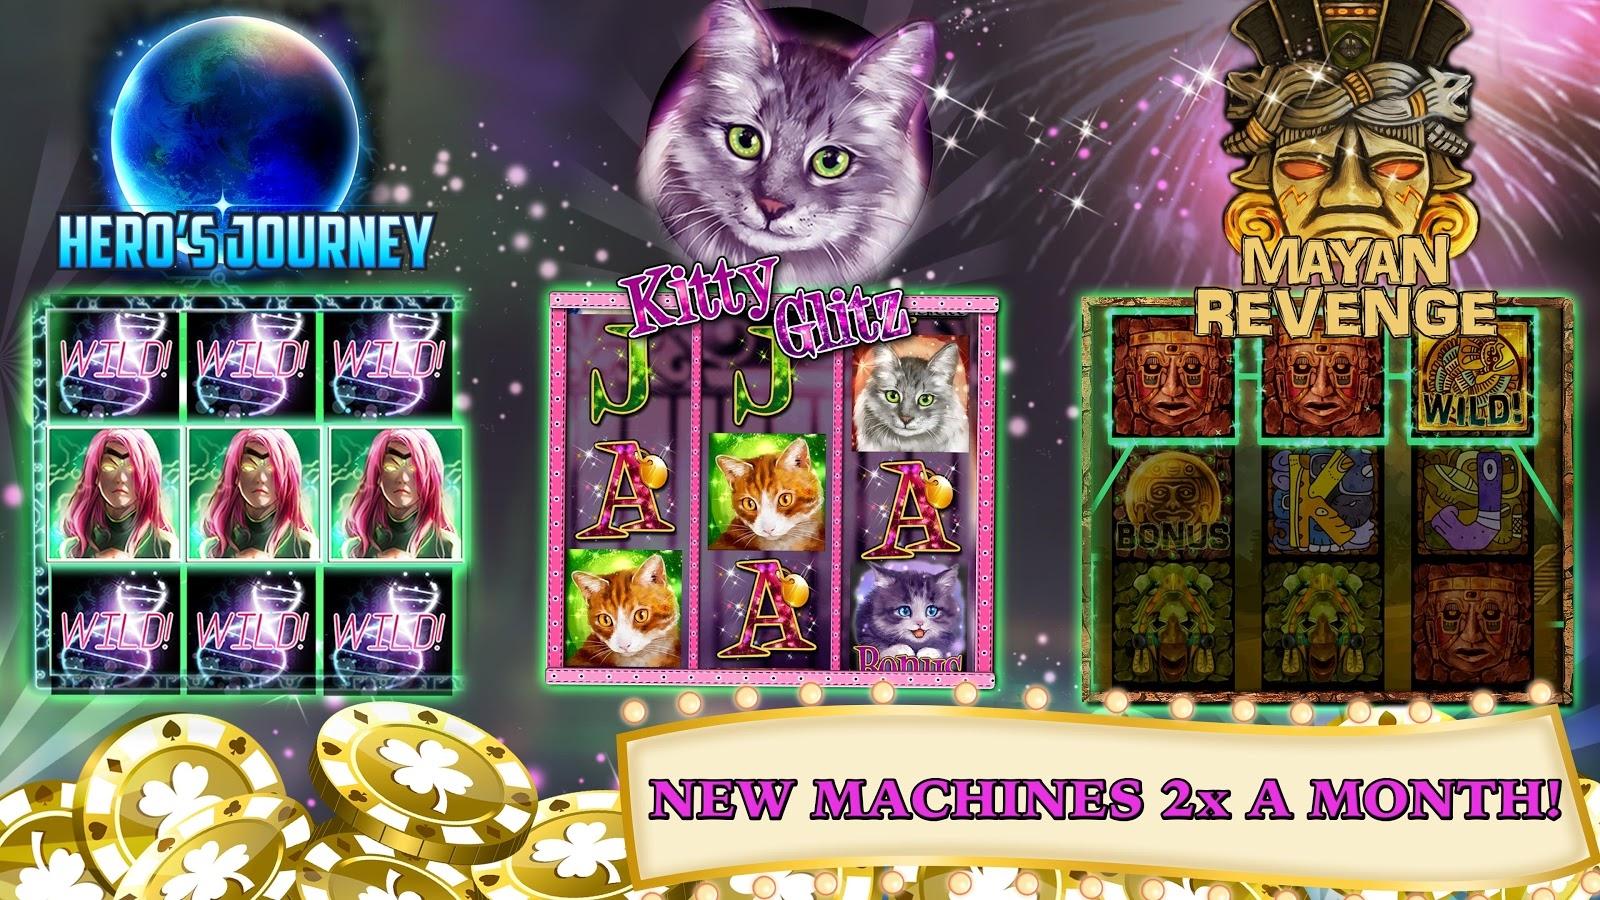 EUR 111 free chip at 888 Casino